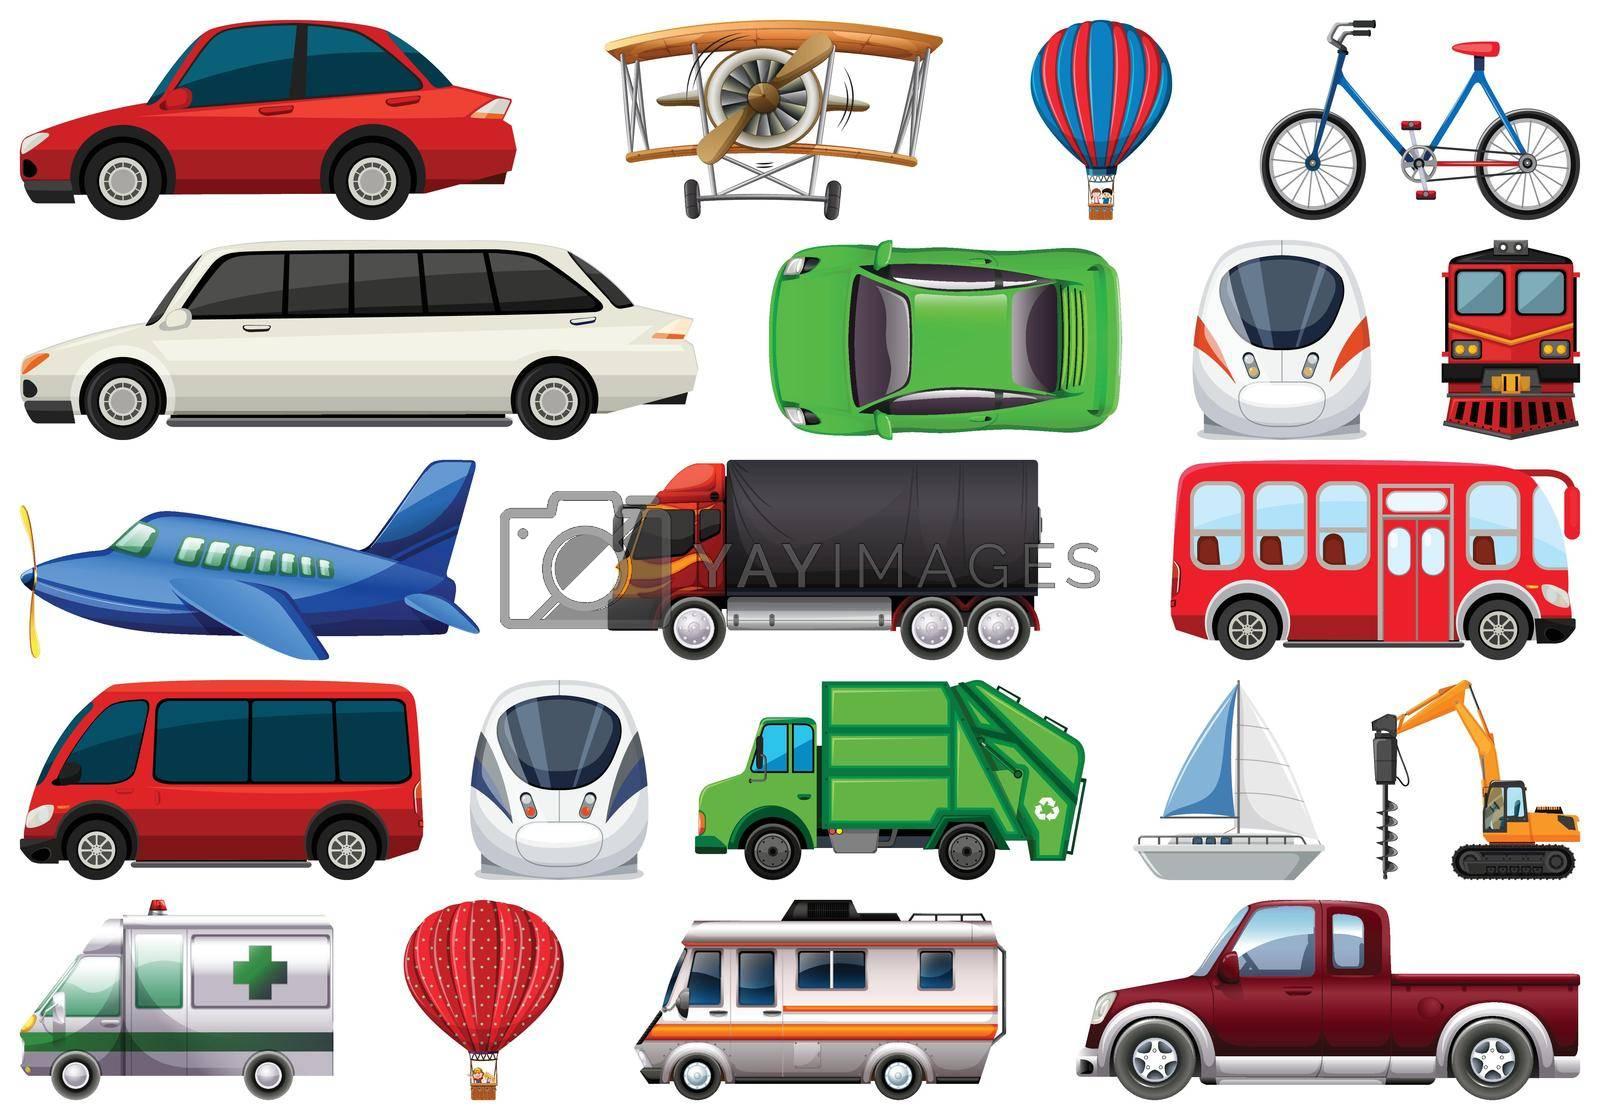 Set of transportation vechiles illustration